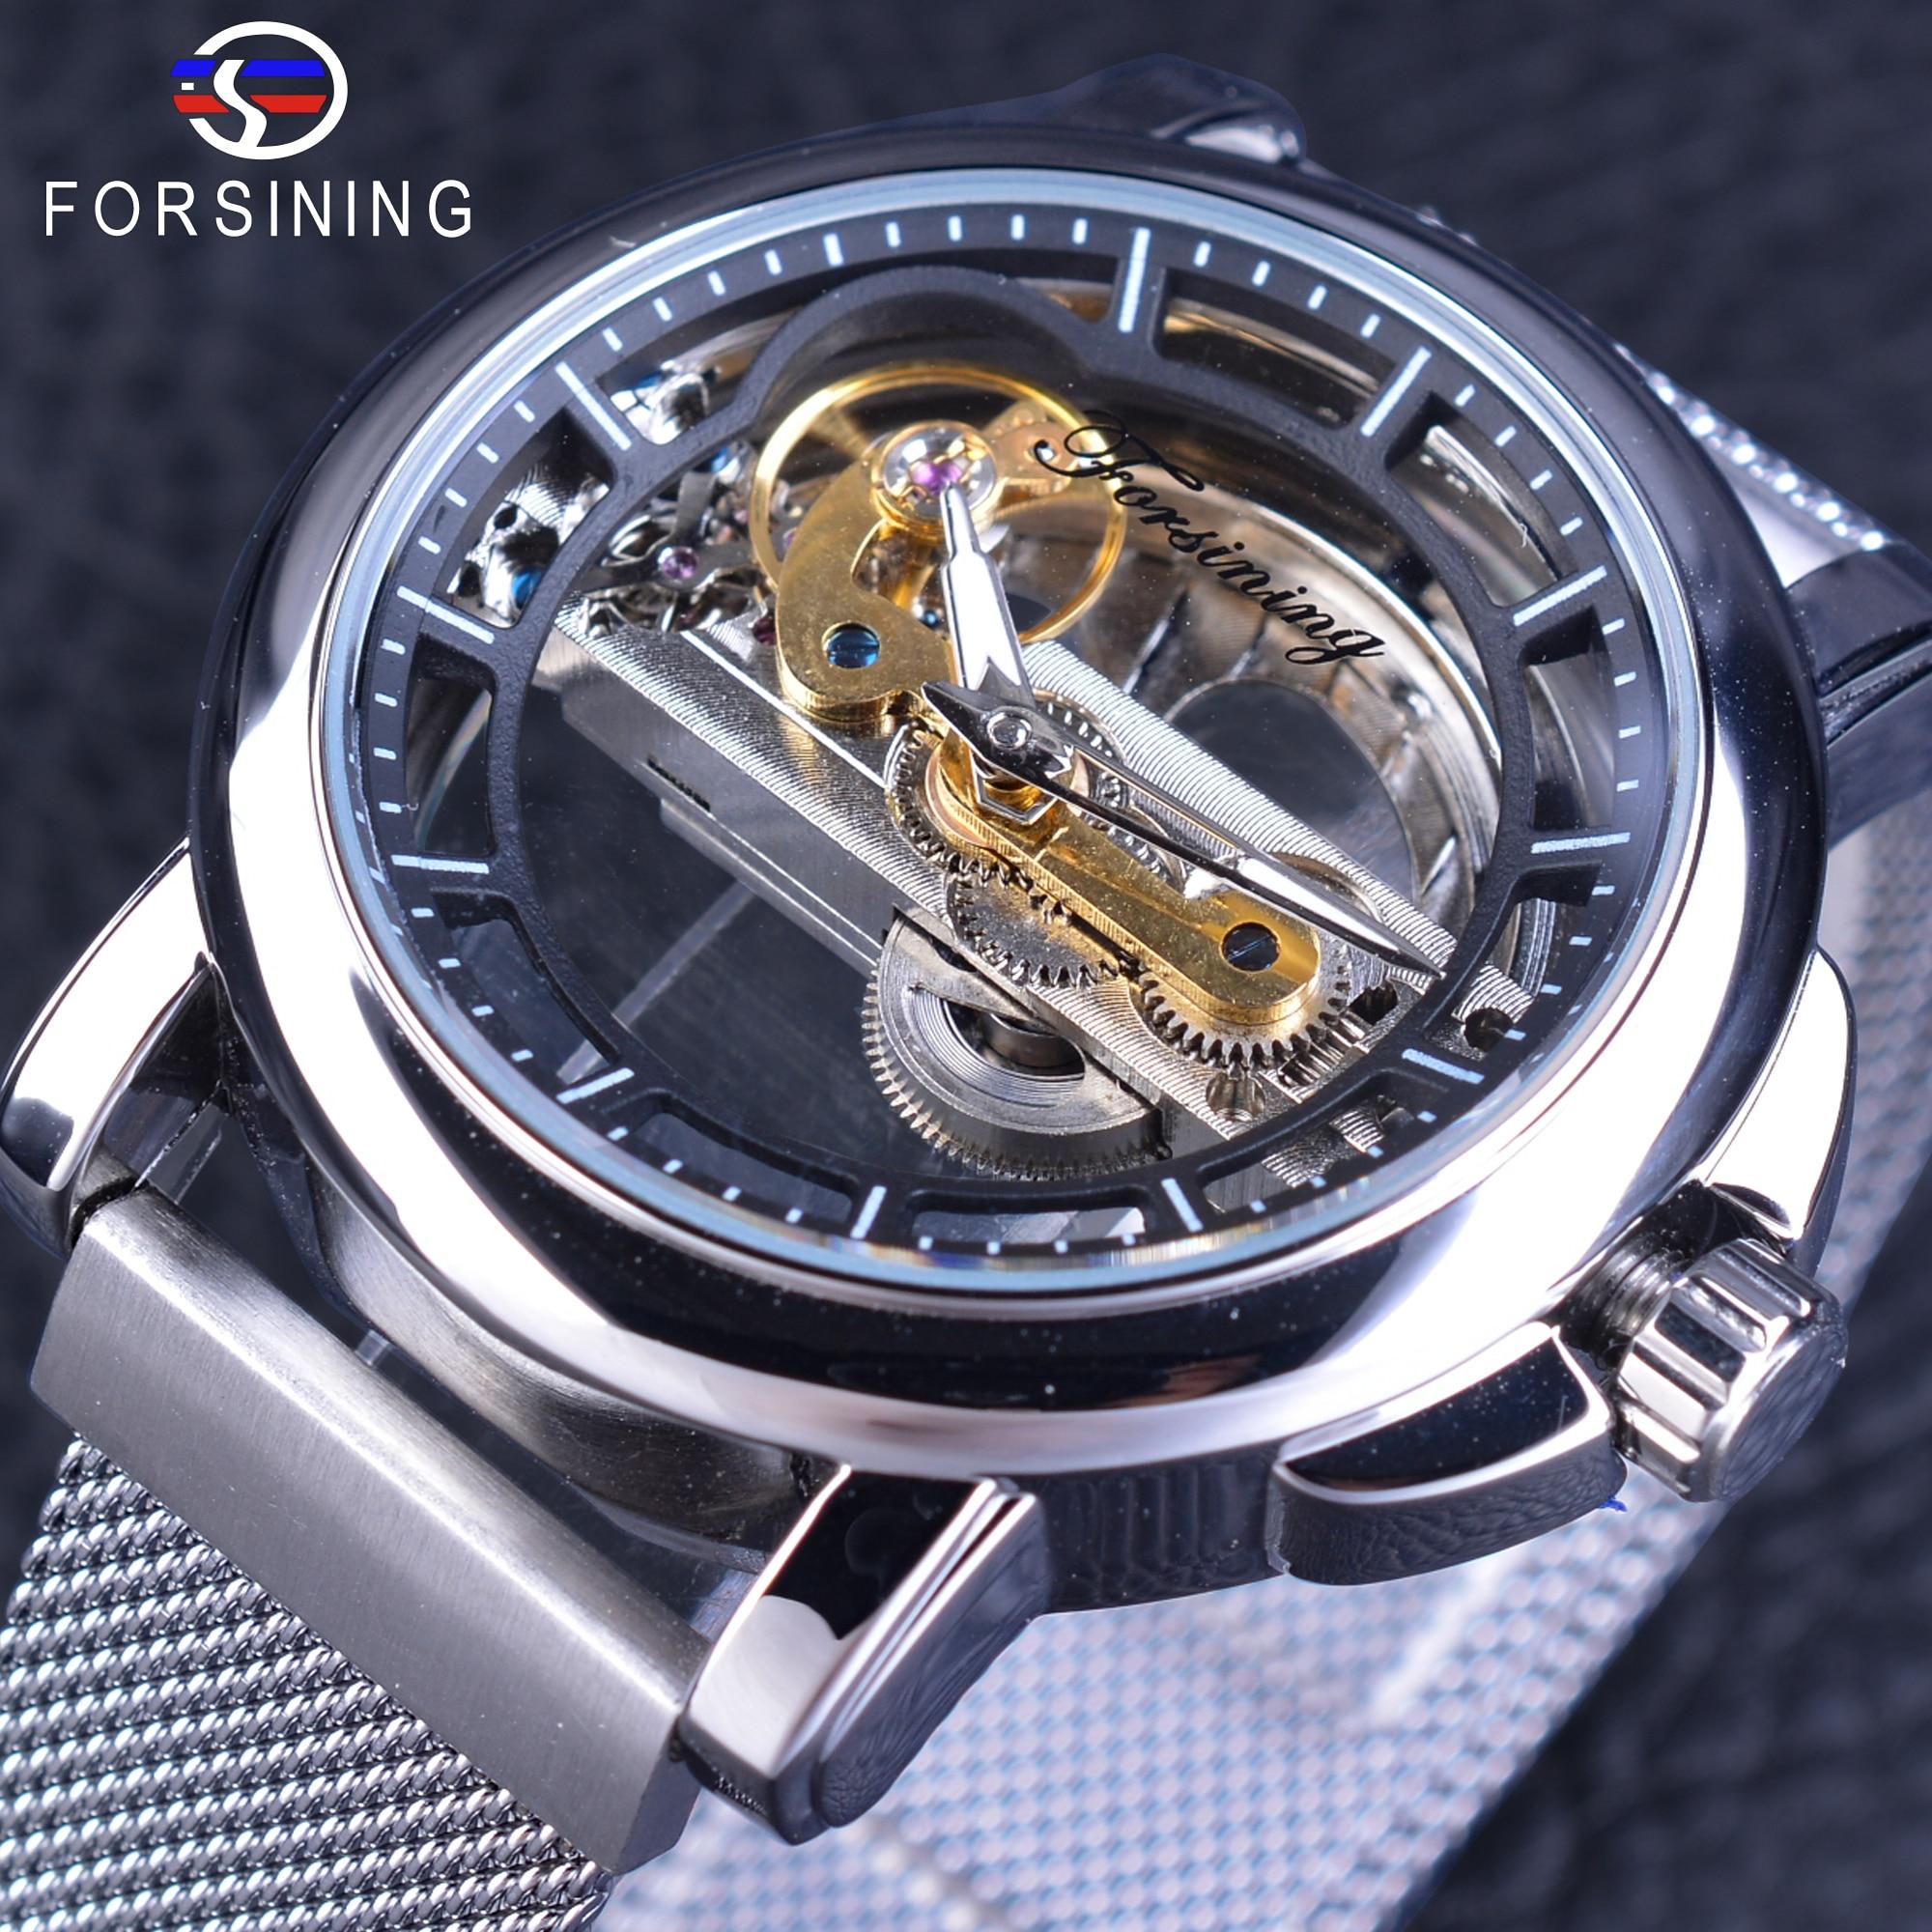 все цены на Forsining Casual Watch Men's Mechanical Watch Top Brand Luxury Waterproof Skeleton Watches Silver Mesh Stainless Steel Band онлайн